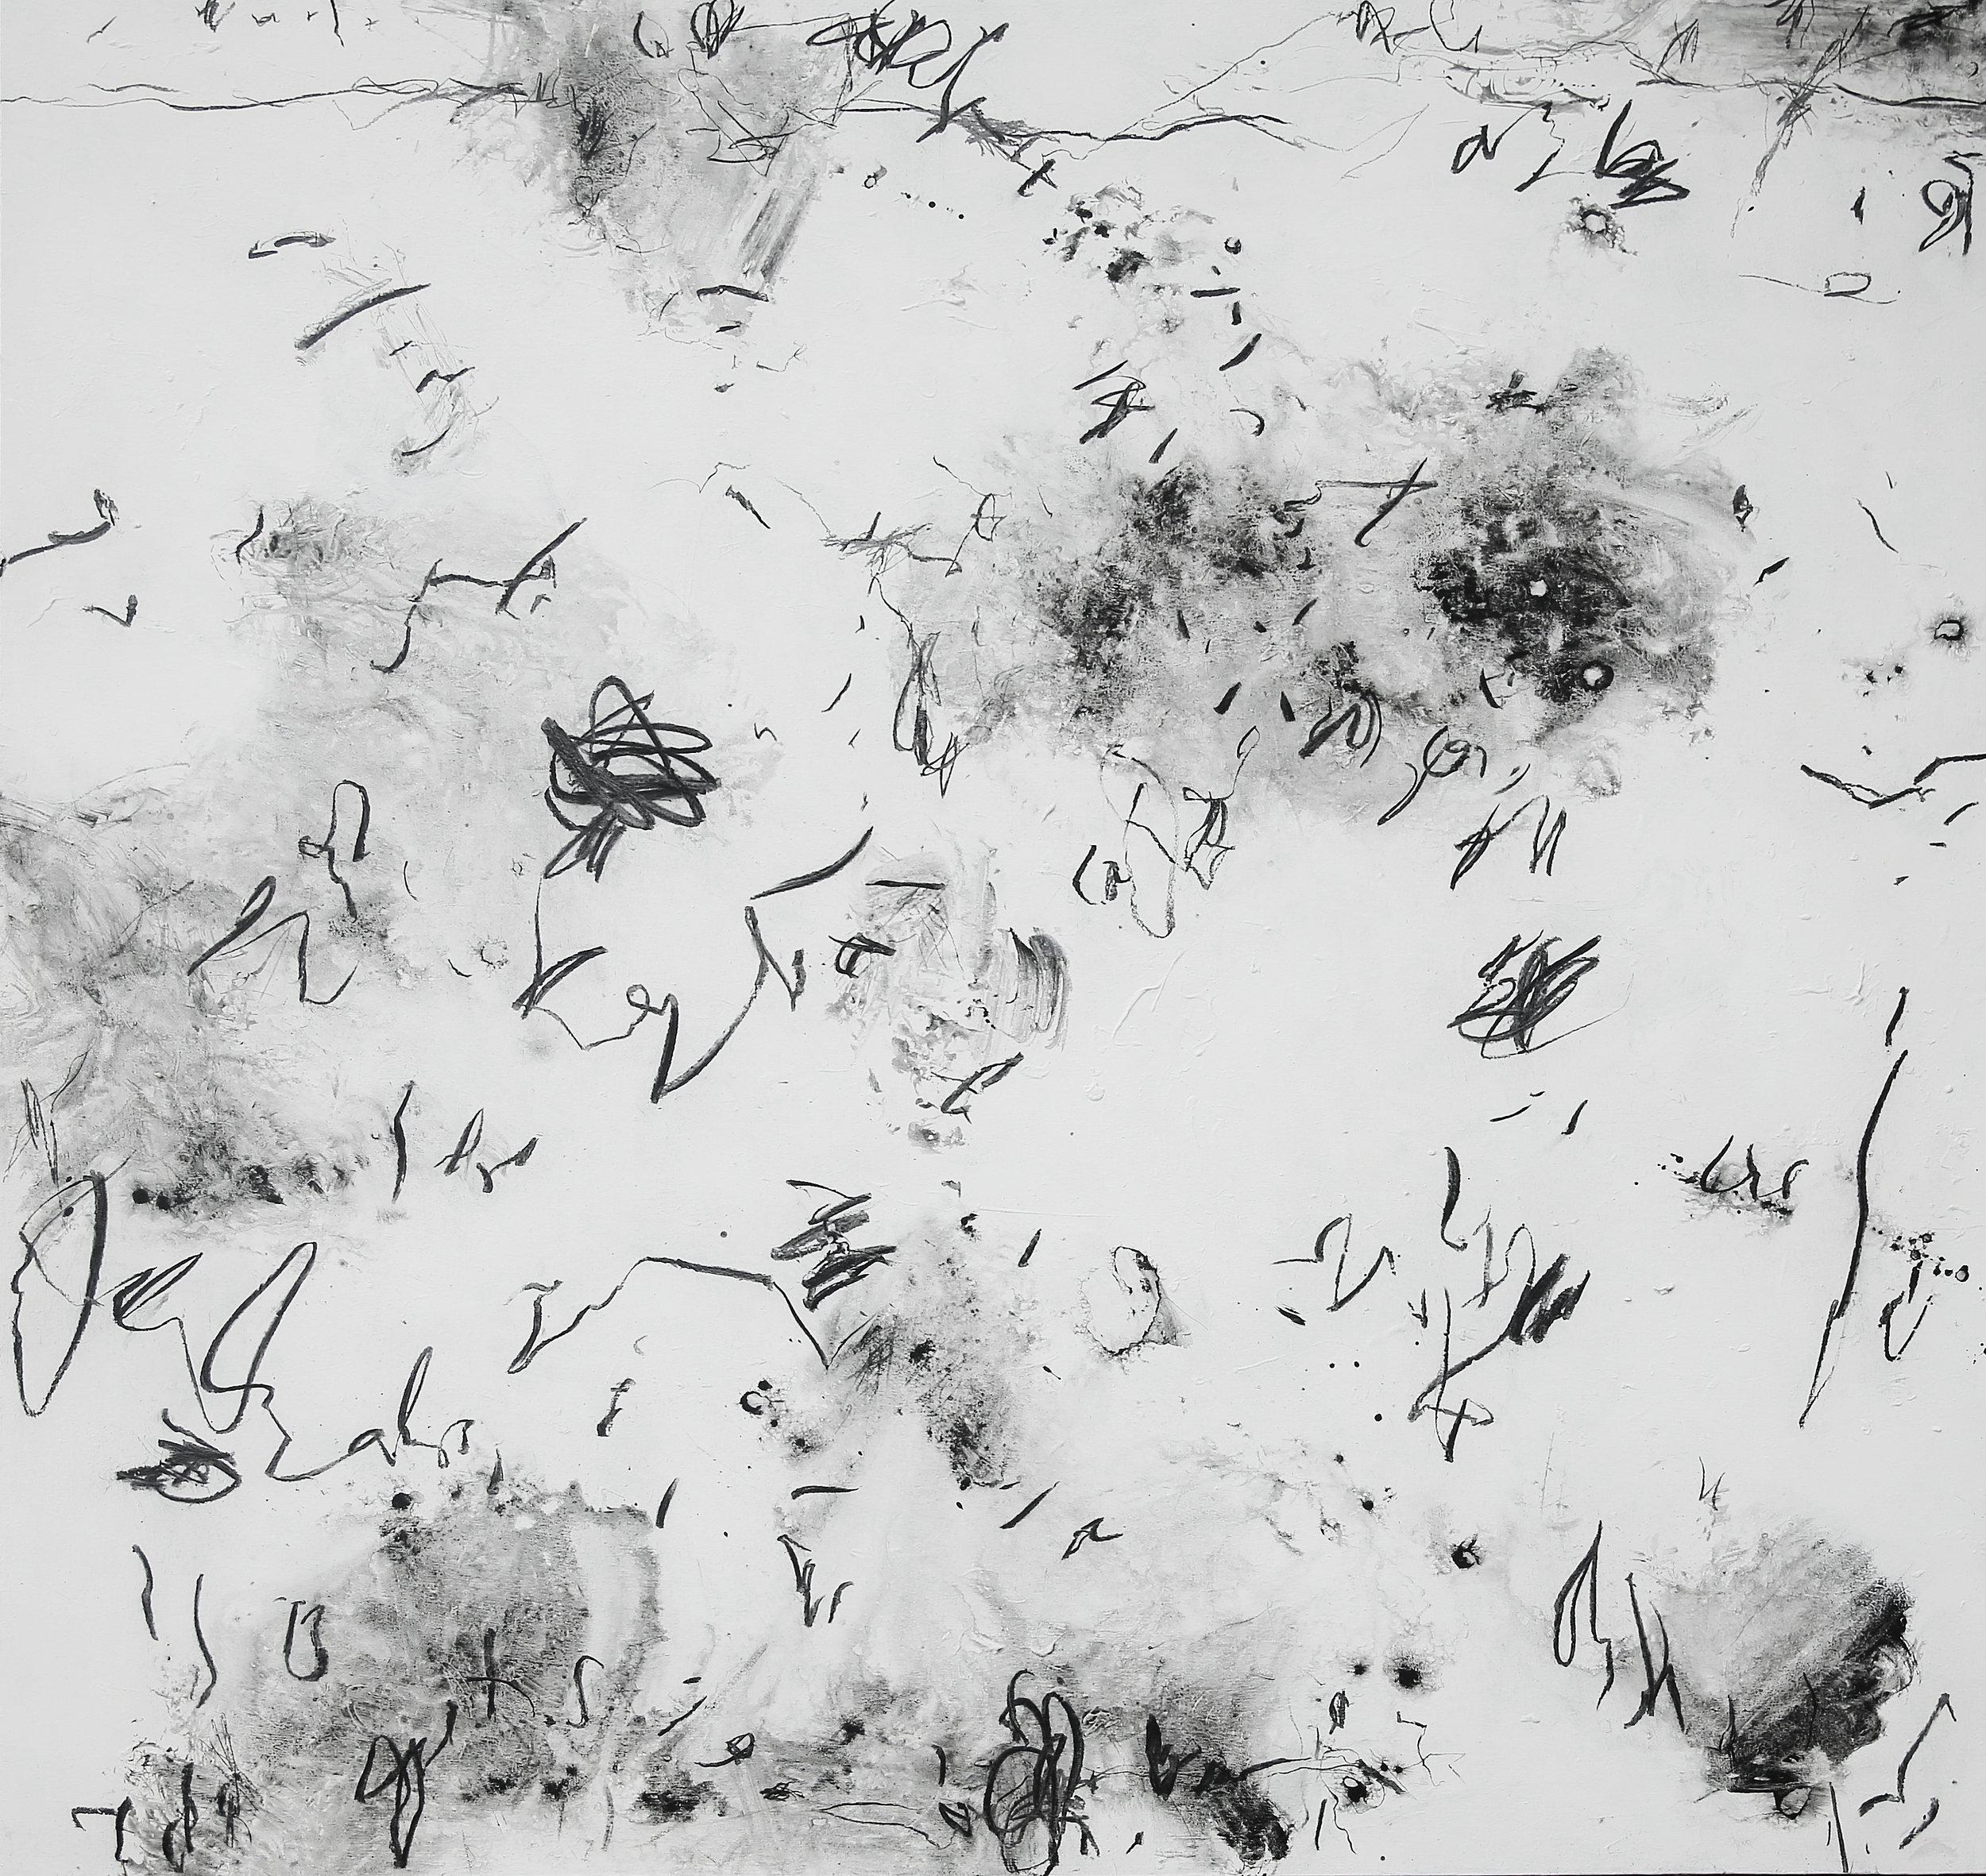 Artist: HEDI SOETARDJA, INDONESIA  Title: Riuh Bersama Hitam Medium: acrylic and charcoal on canvas  Dimension: 150 X 150 cm  Year: 2019    SOLD